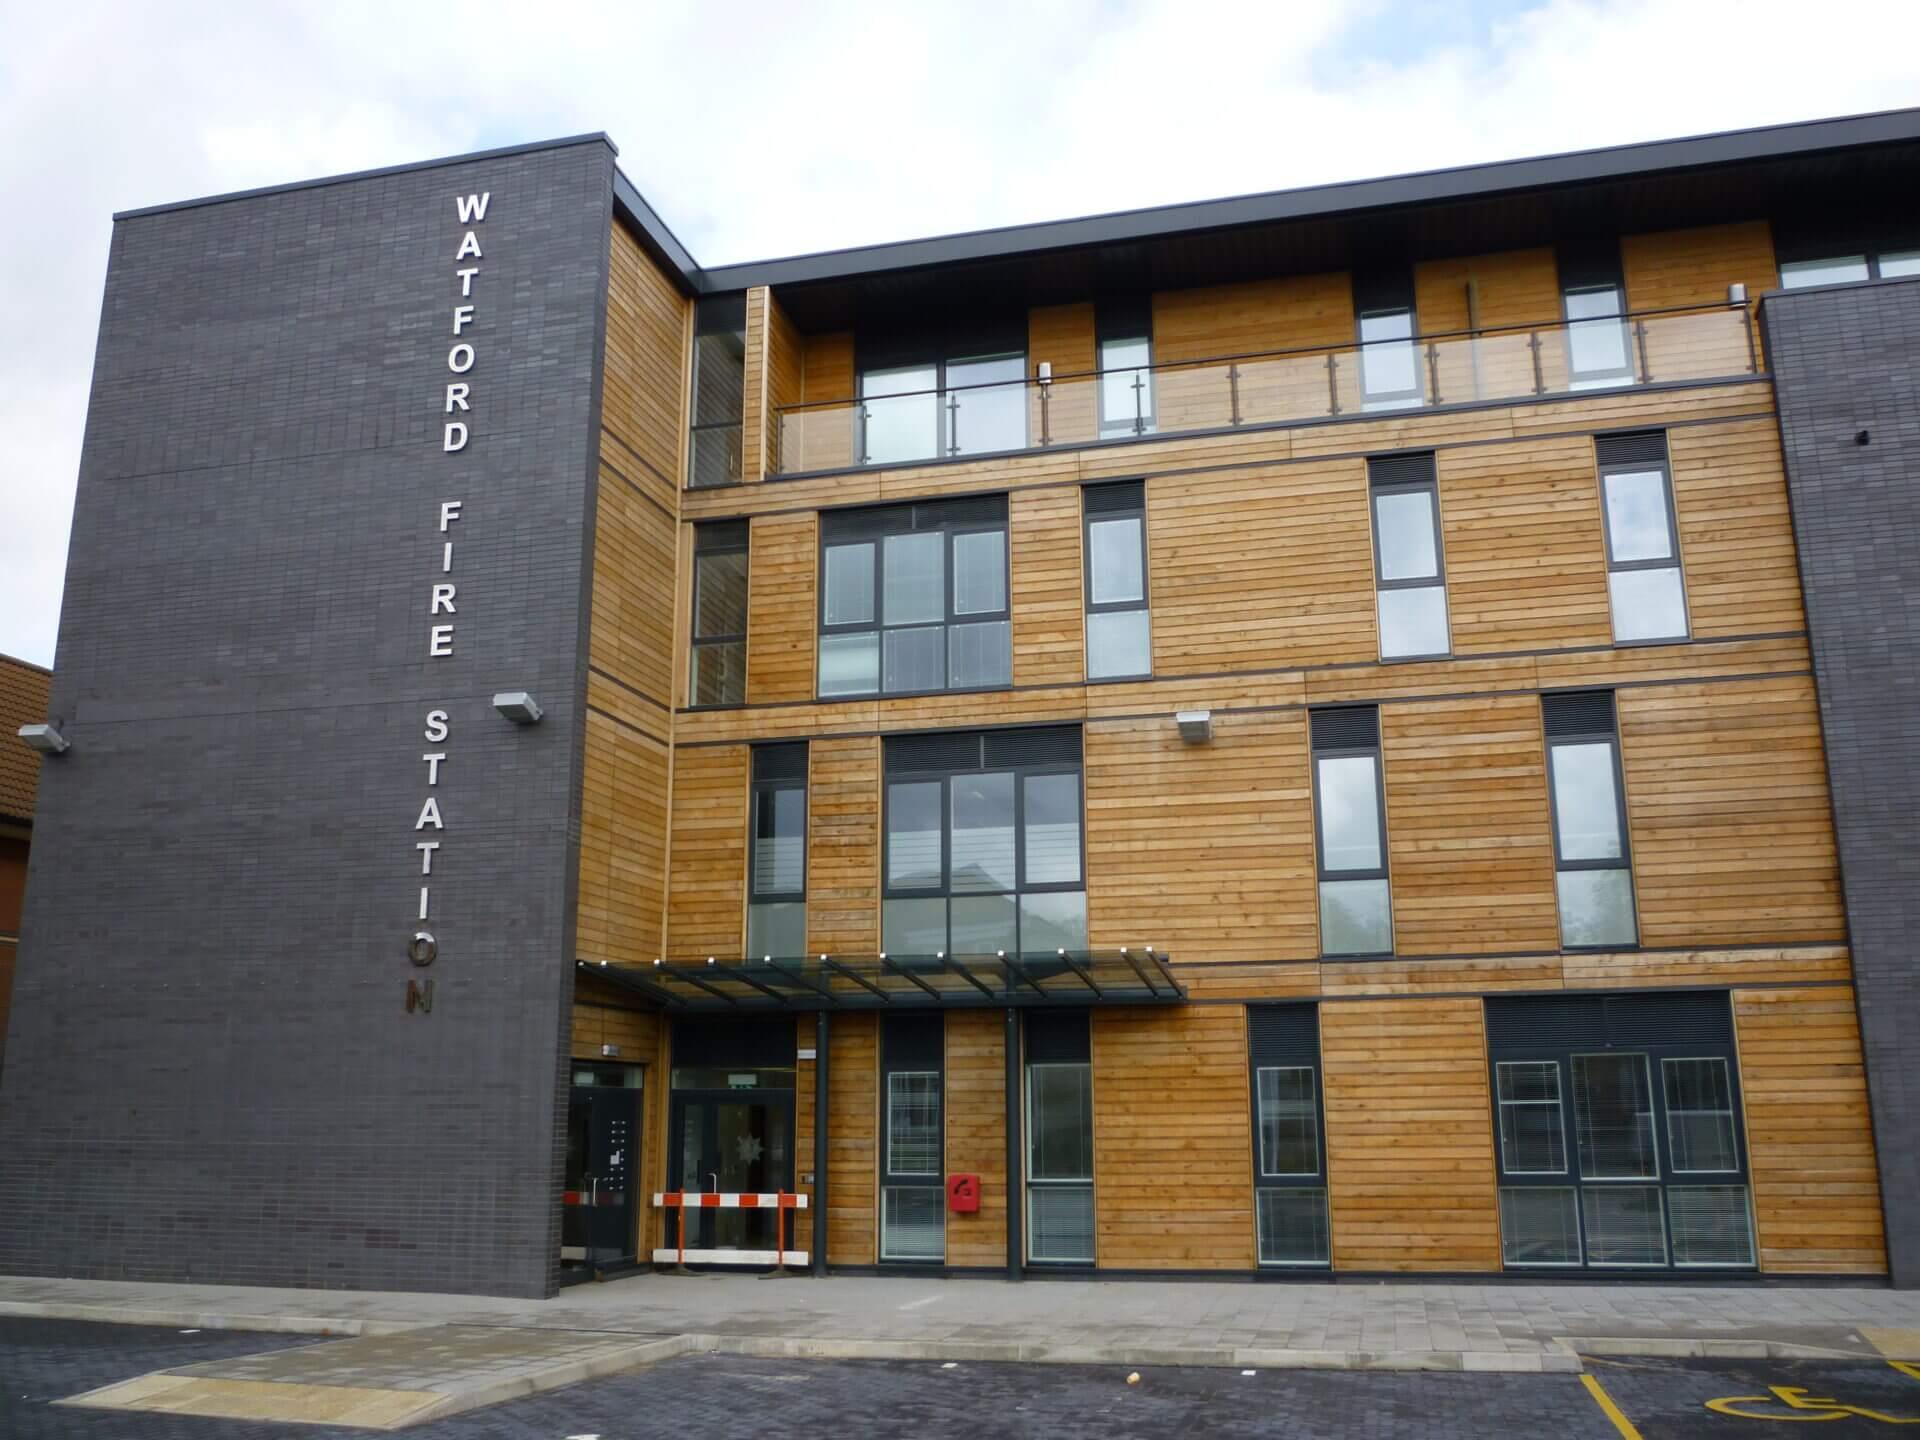 Watford – Watford Fire Station (2008)